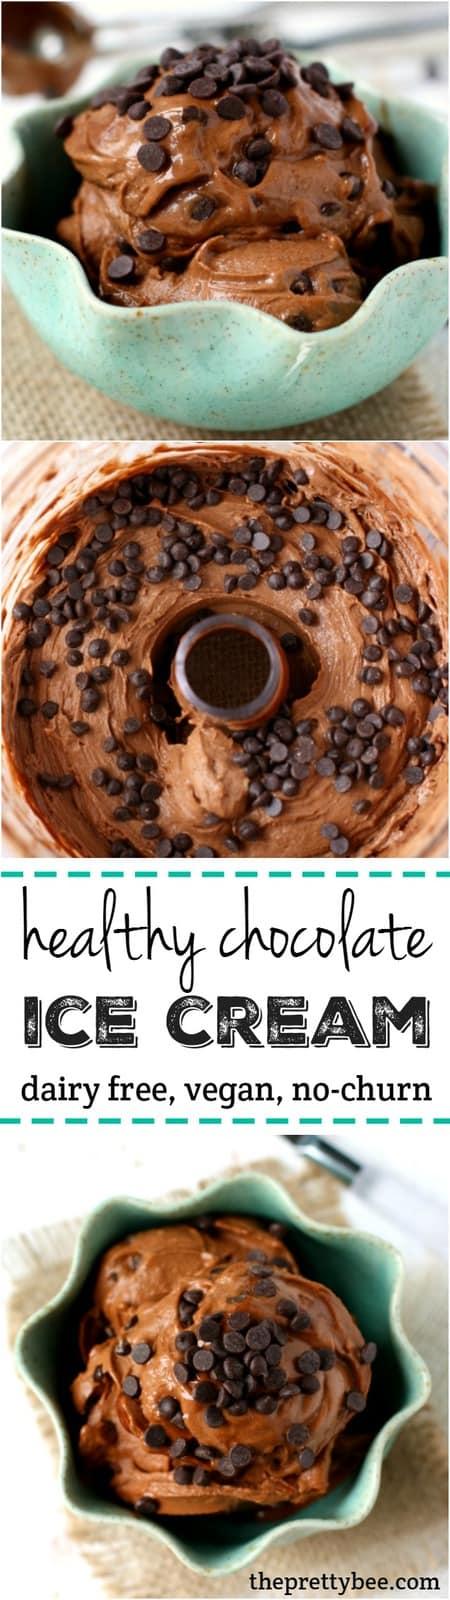 Healthy Double Chocolate Ice Cream. - The Pretty Bee